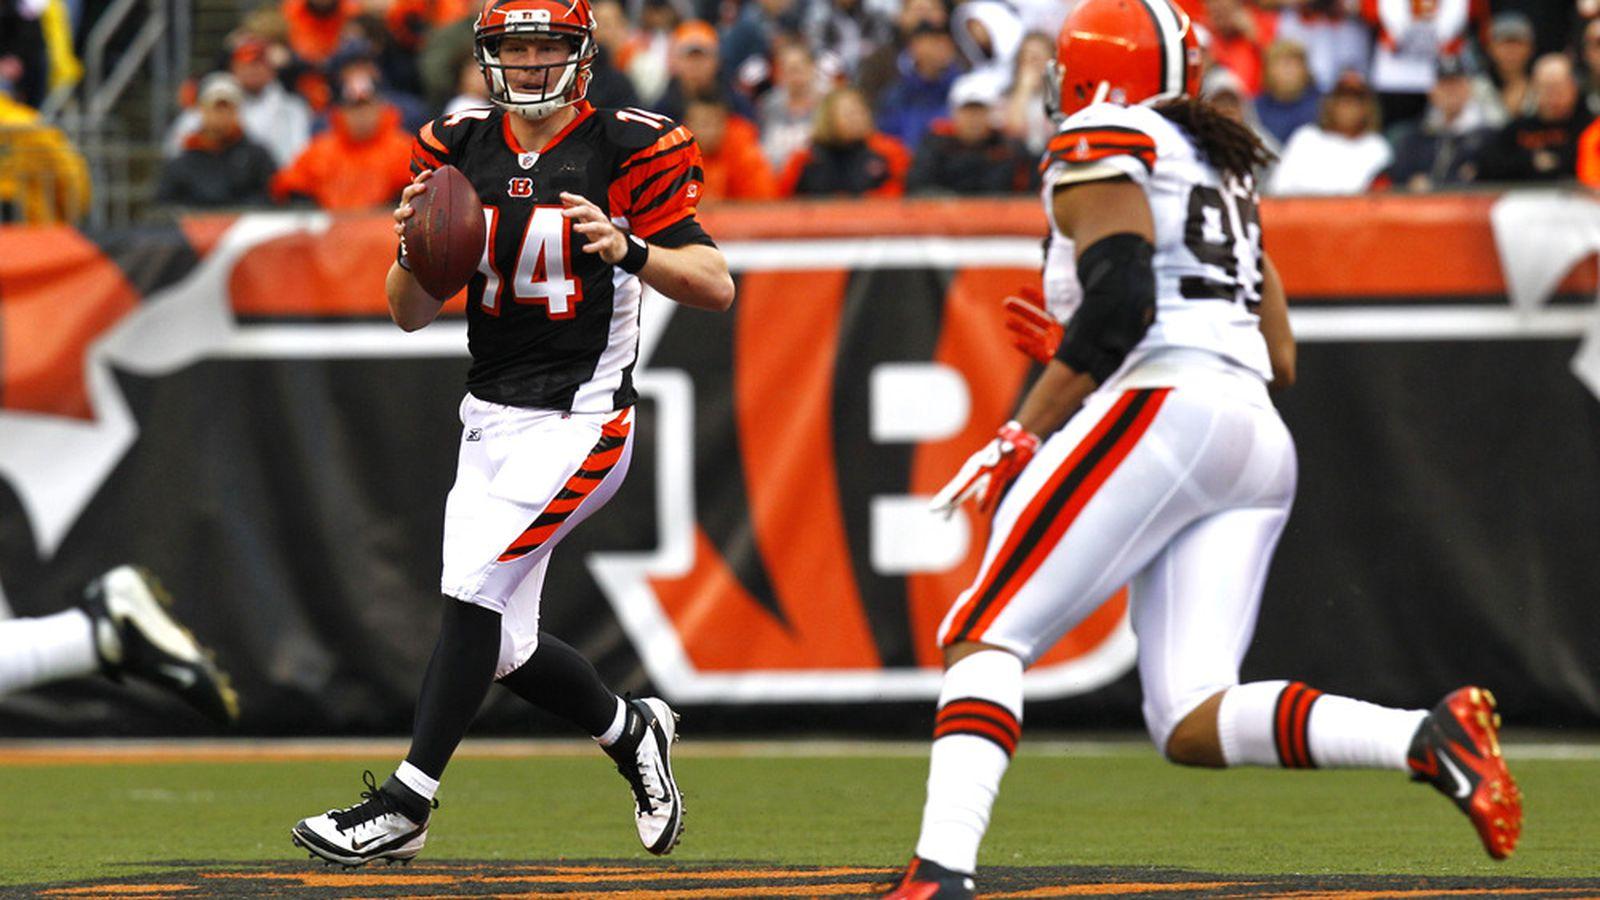 Browns Vs. Bengals: Andy Dalton Leads Cincinnati Comeback